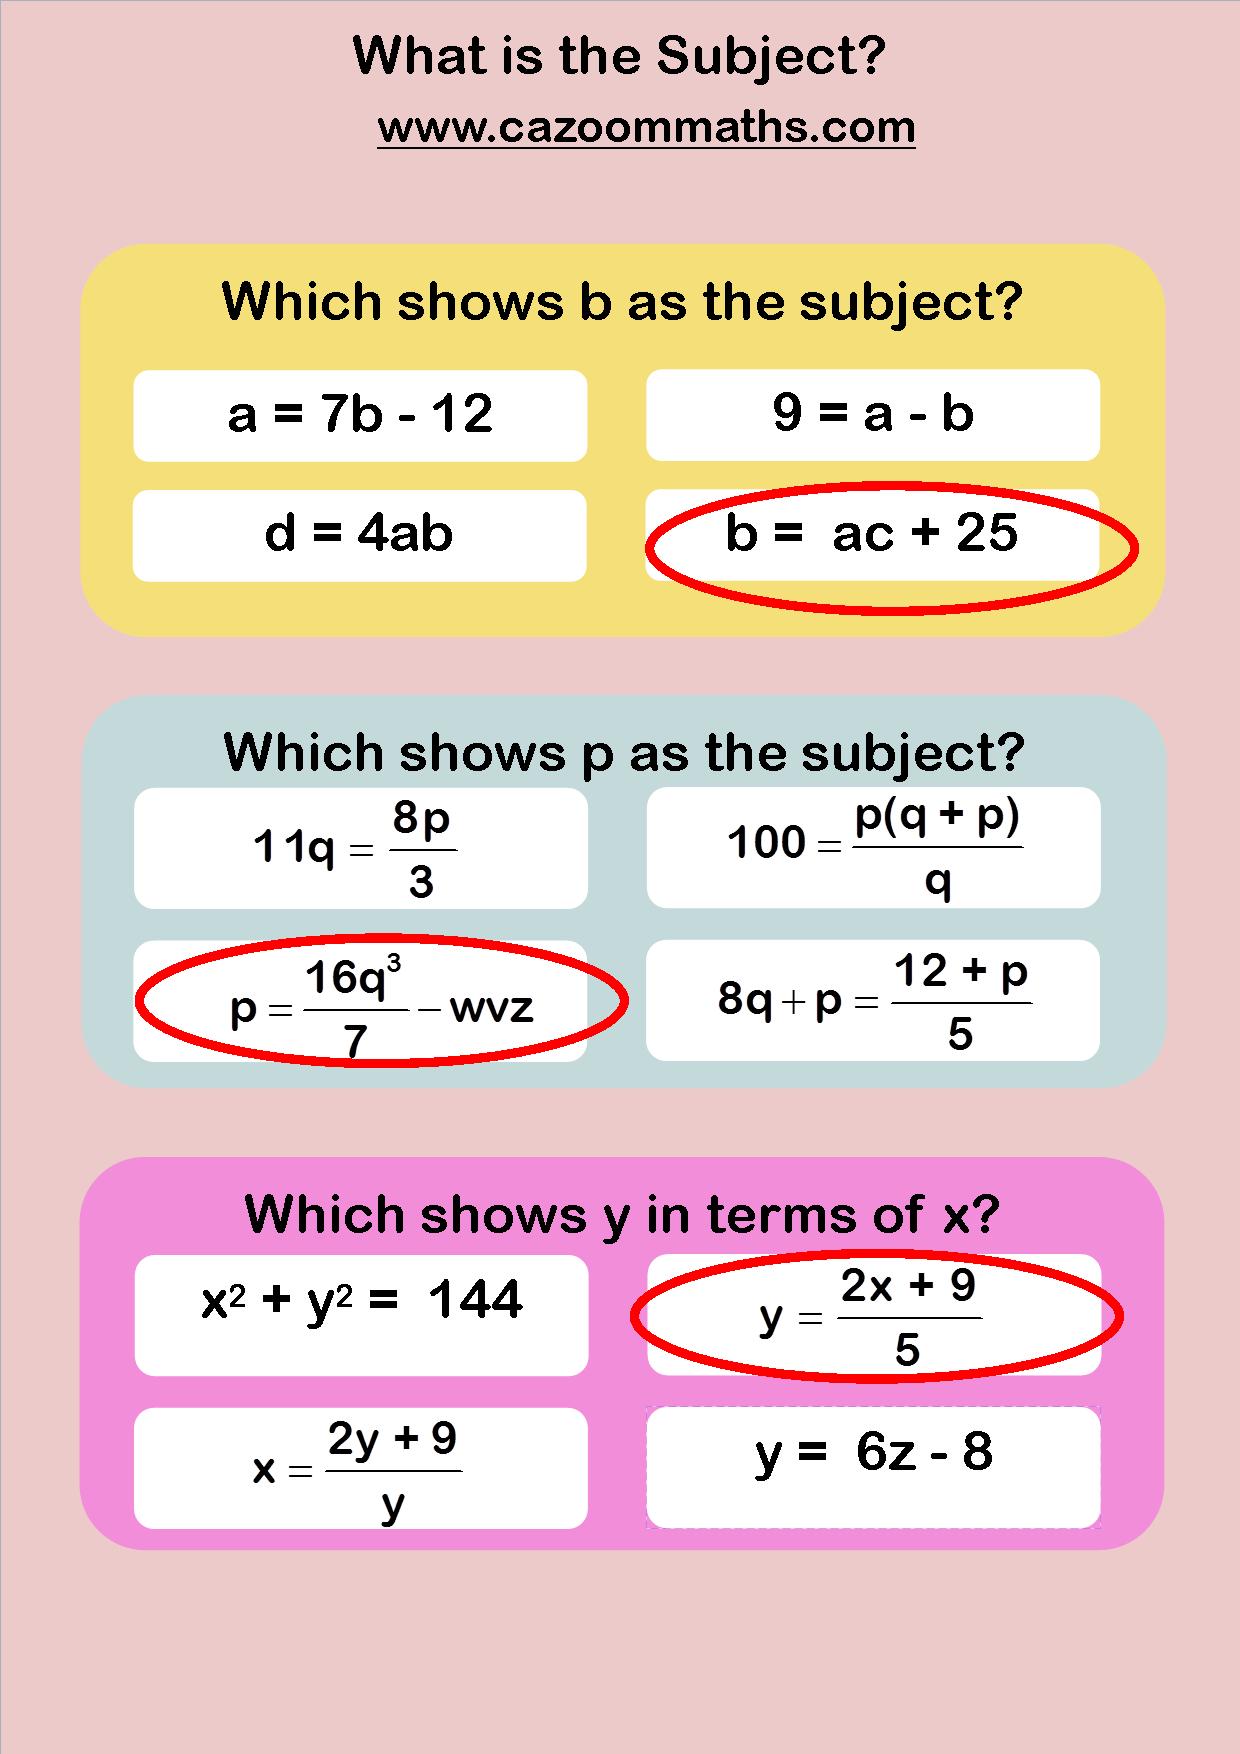 Fun Algebra Worksheets Ks3 And Ks4 Algebra Maths Resources Algebra Worksheets Math Resources Algebra Resources